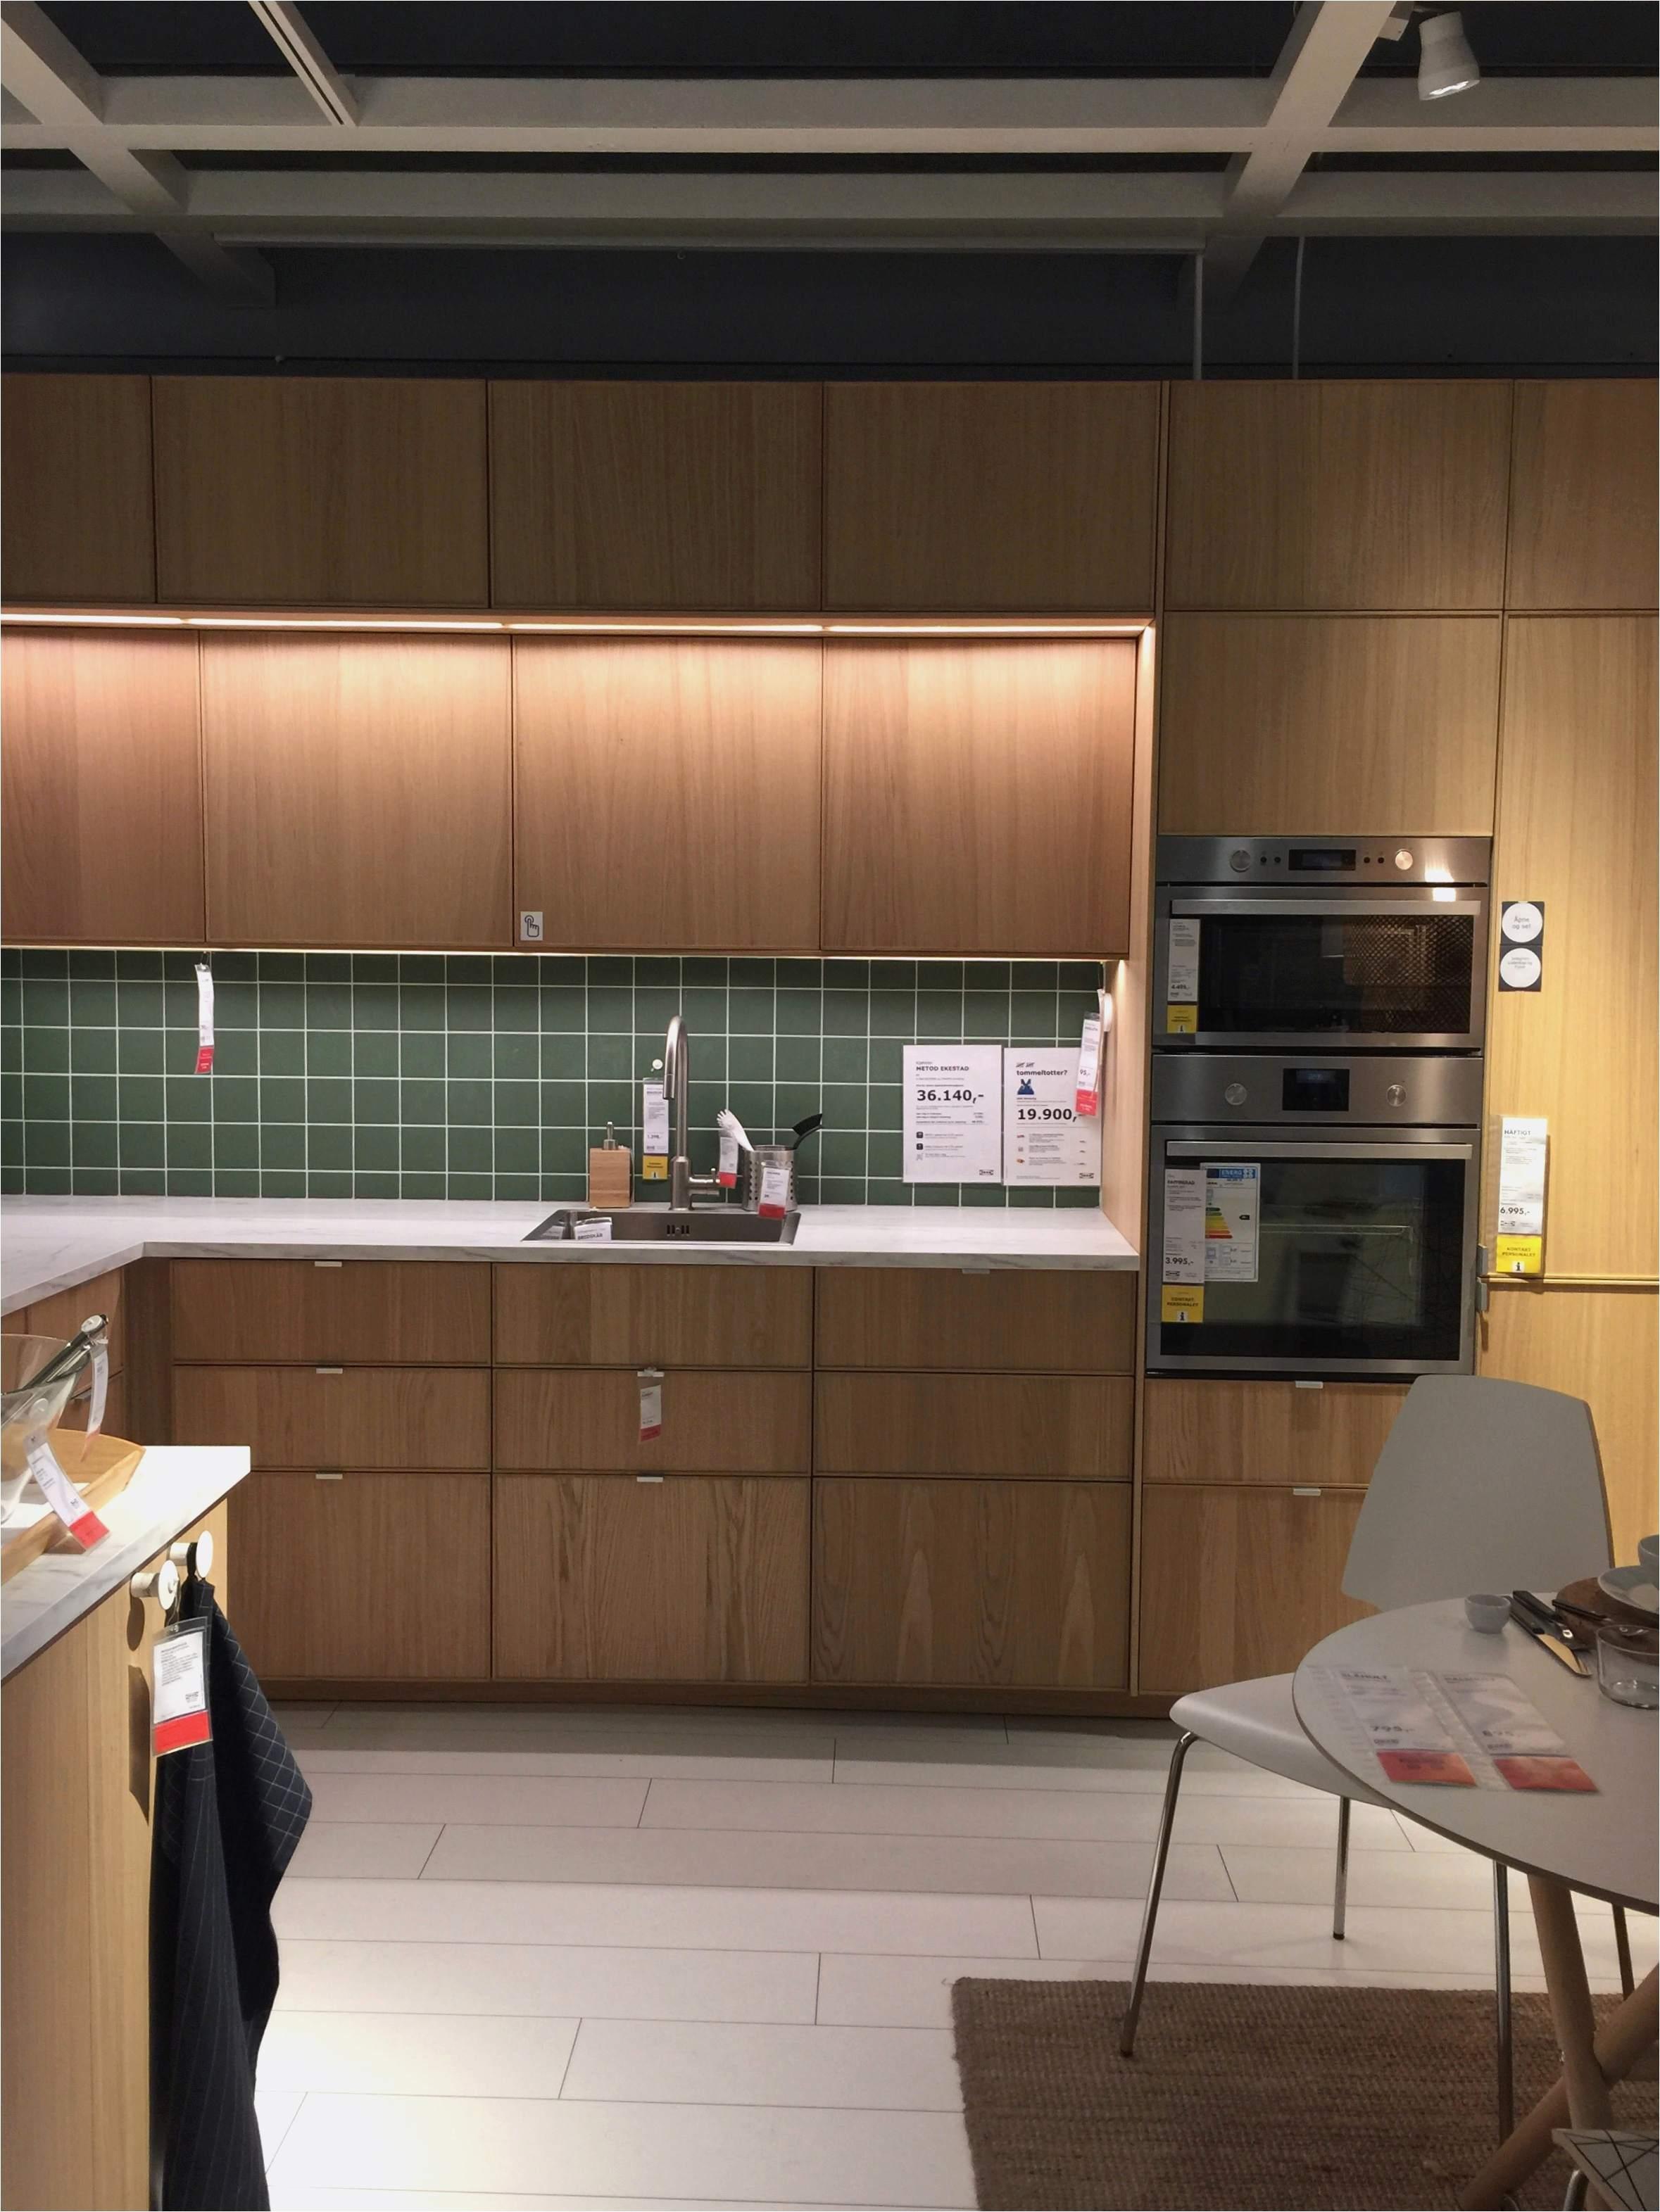 Jouet Cuisine Ikea Meilleur De Collection 13 Magnifique Jouet Cuisine Ikea Cuisine Et Jardin Cuisine Et Jardin